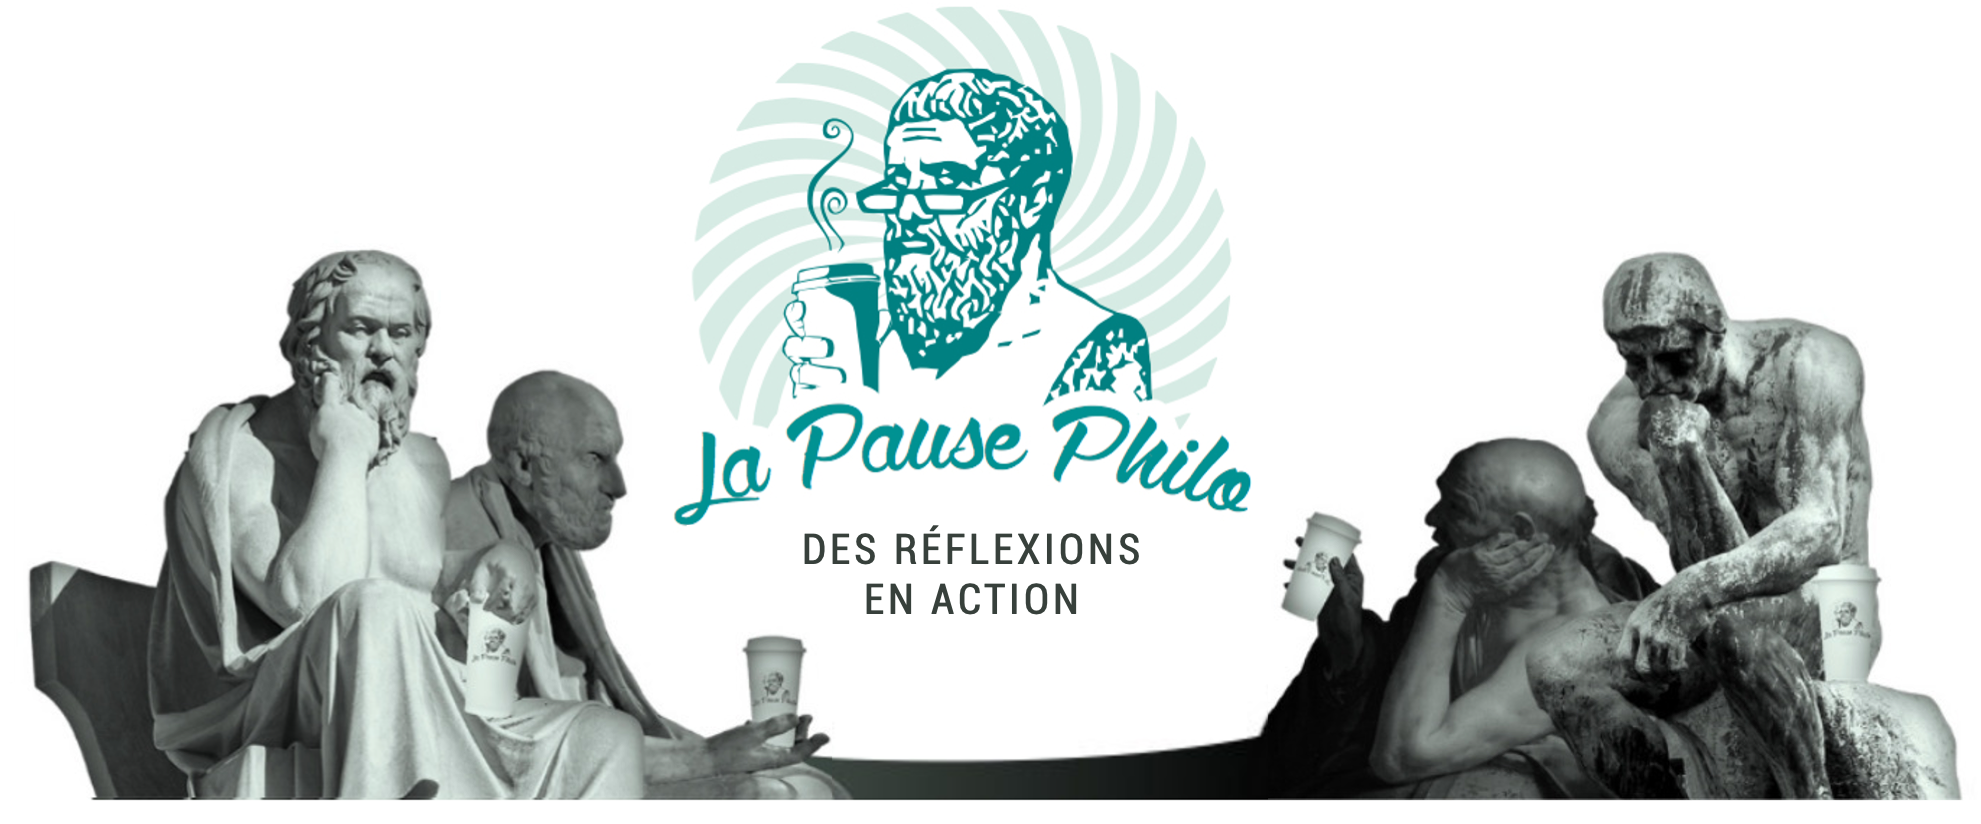 La Pause Philo